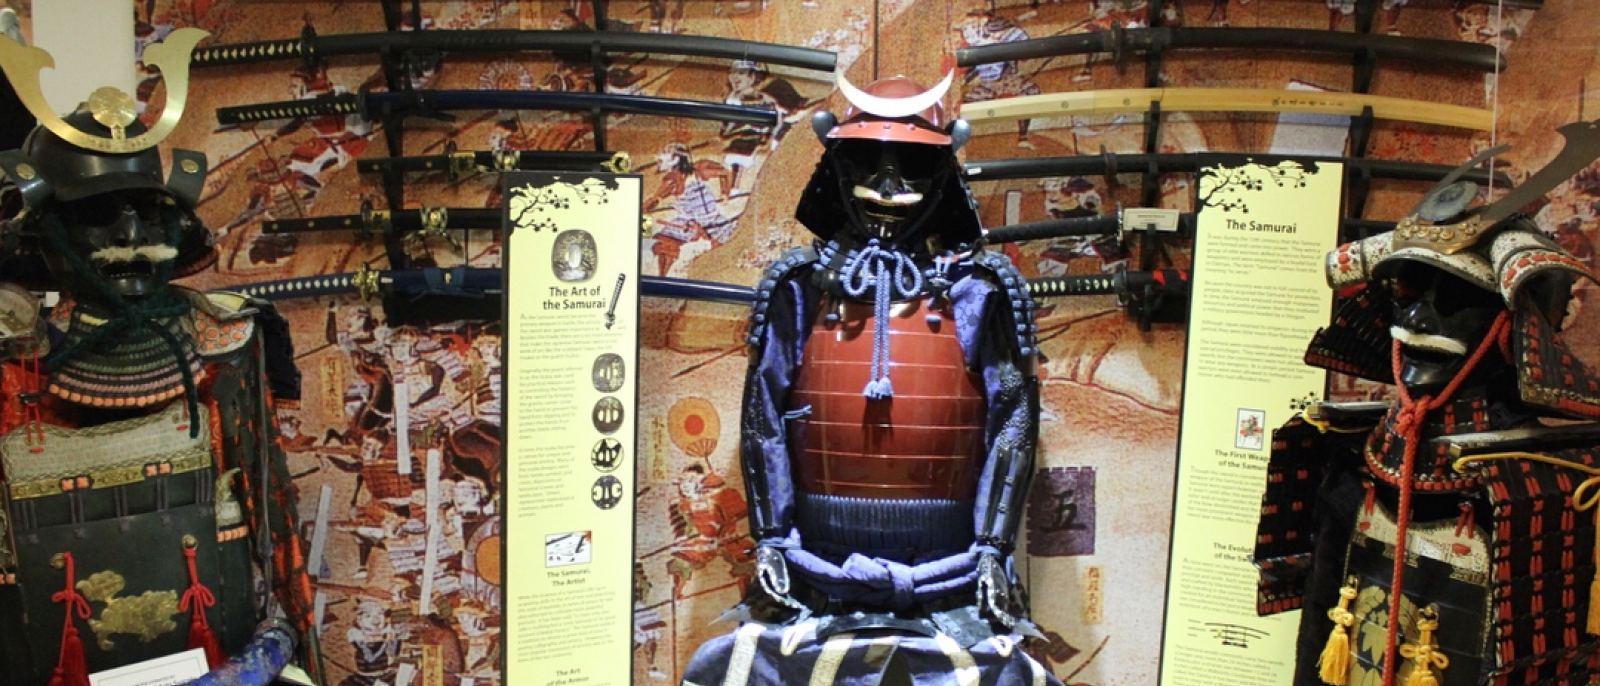 Samurai display at the Martial Arts History Museum